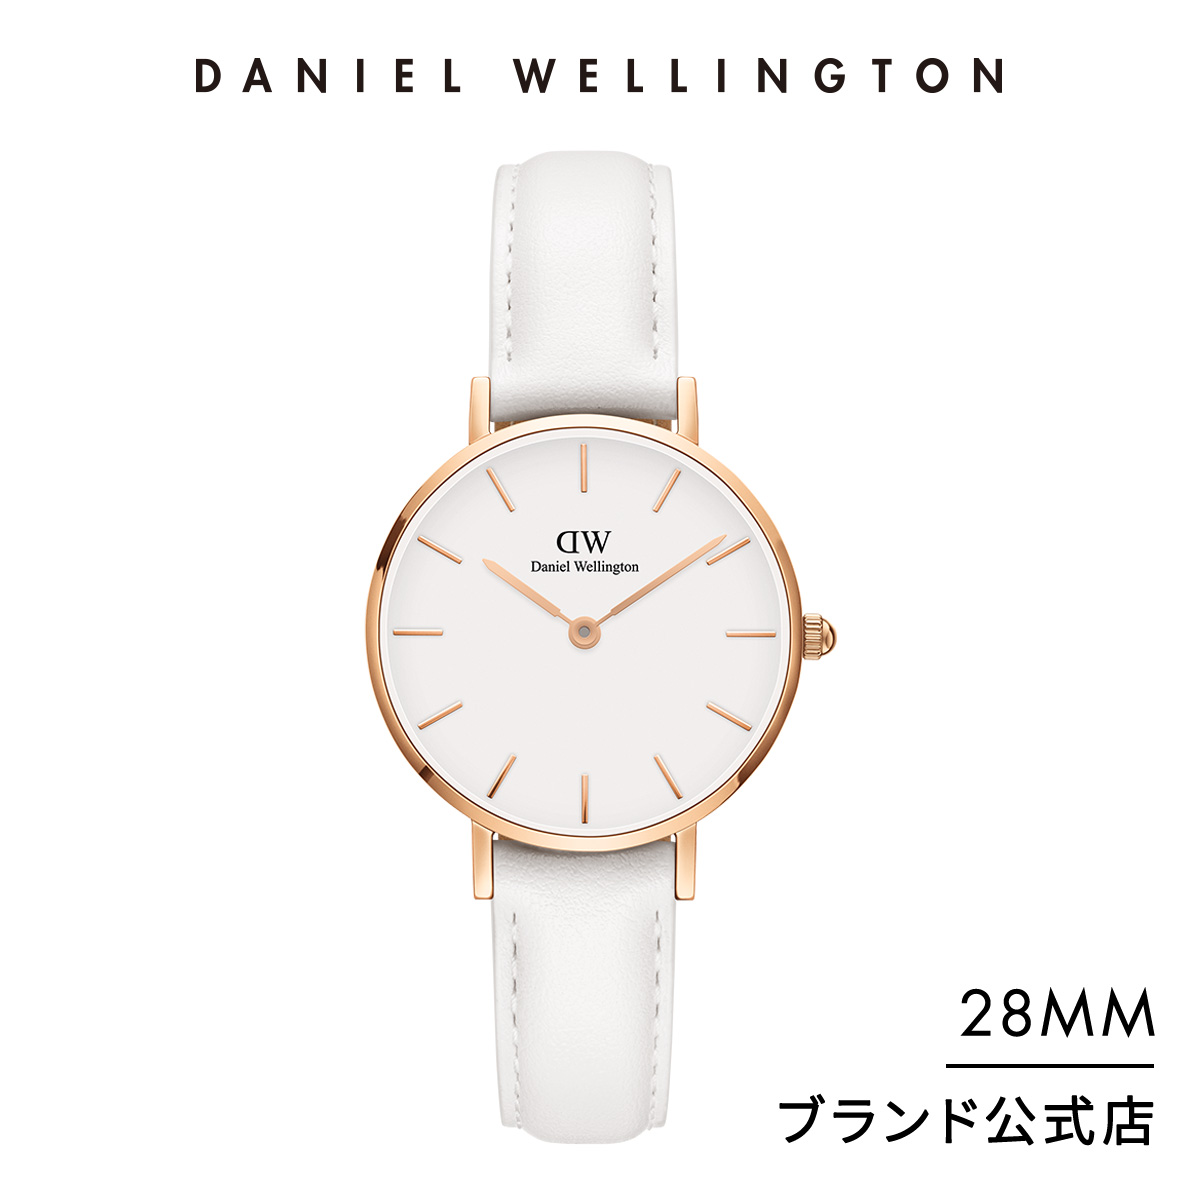 5d5337f8c1 【公式2年保証/送料無料】ダニエルウェリントン公式 レディース 腕時計 Classic Petite